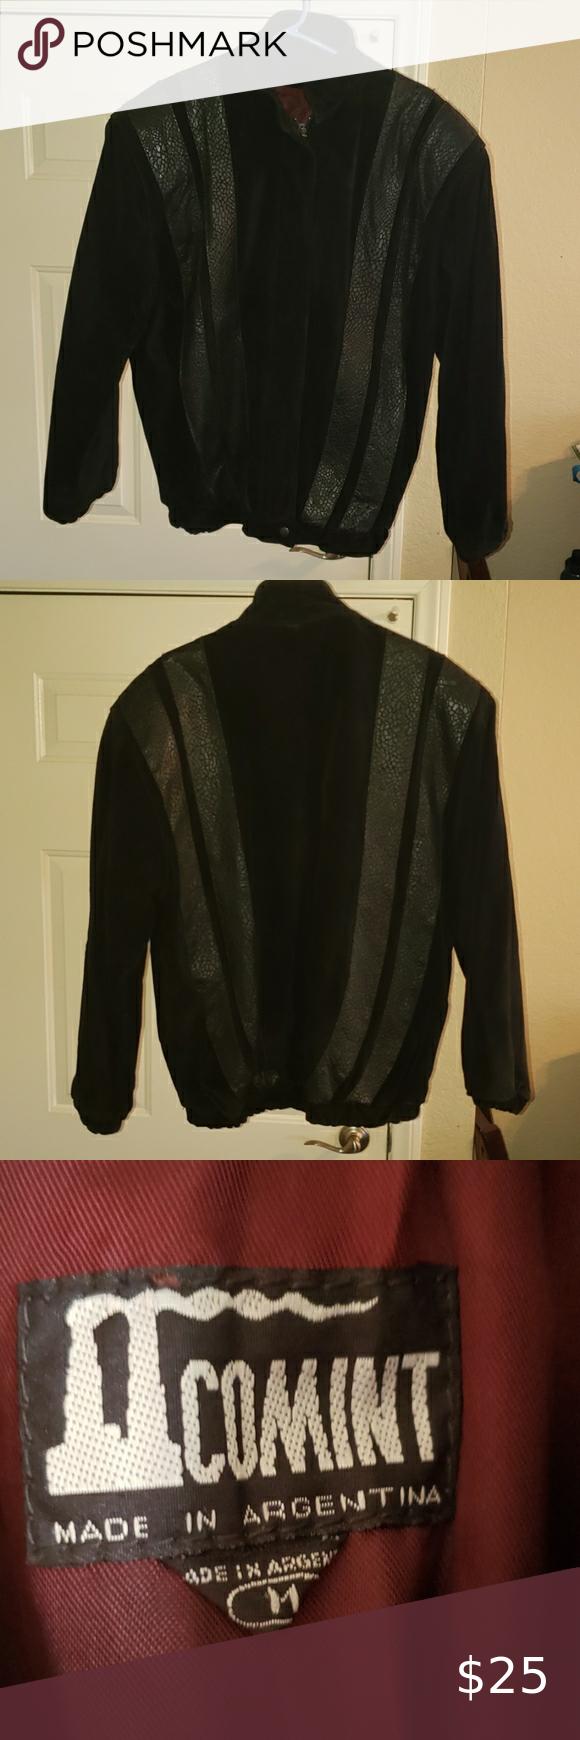 Comint Leather Jacket Vintage Vintage Leather Jacket Jackets Leather Jacket [ 1740 x 580 Pixel ]